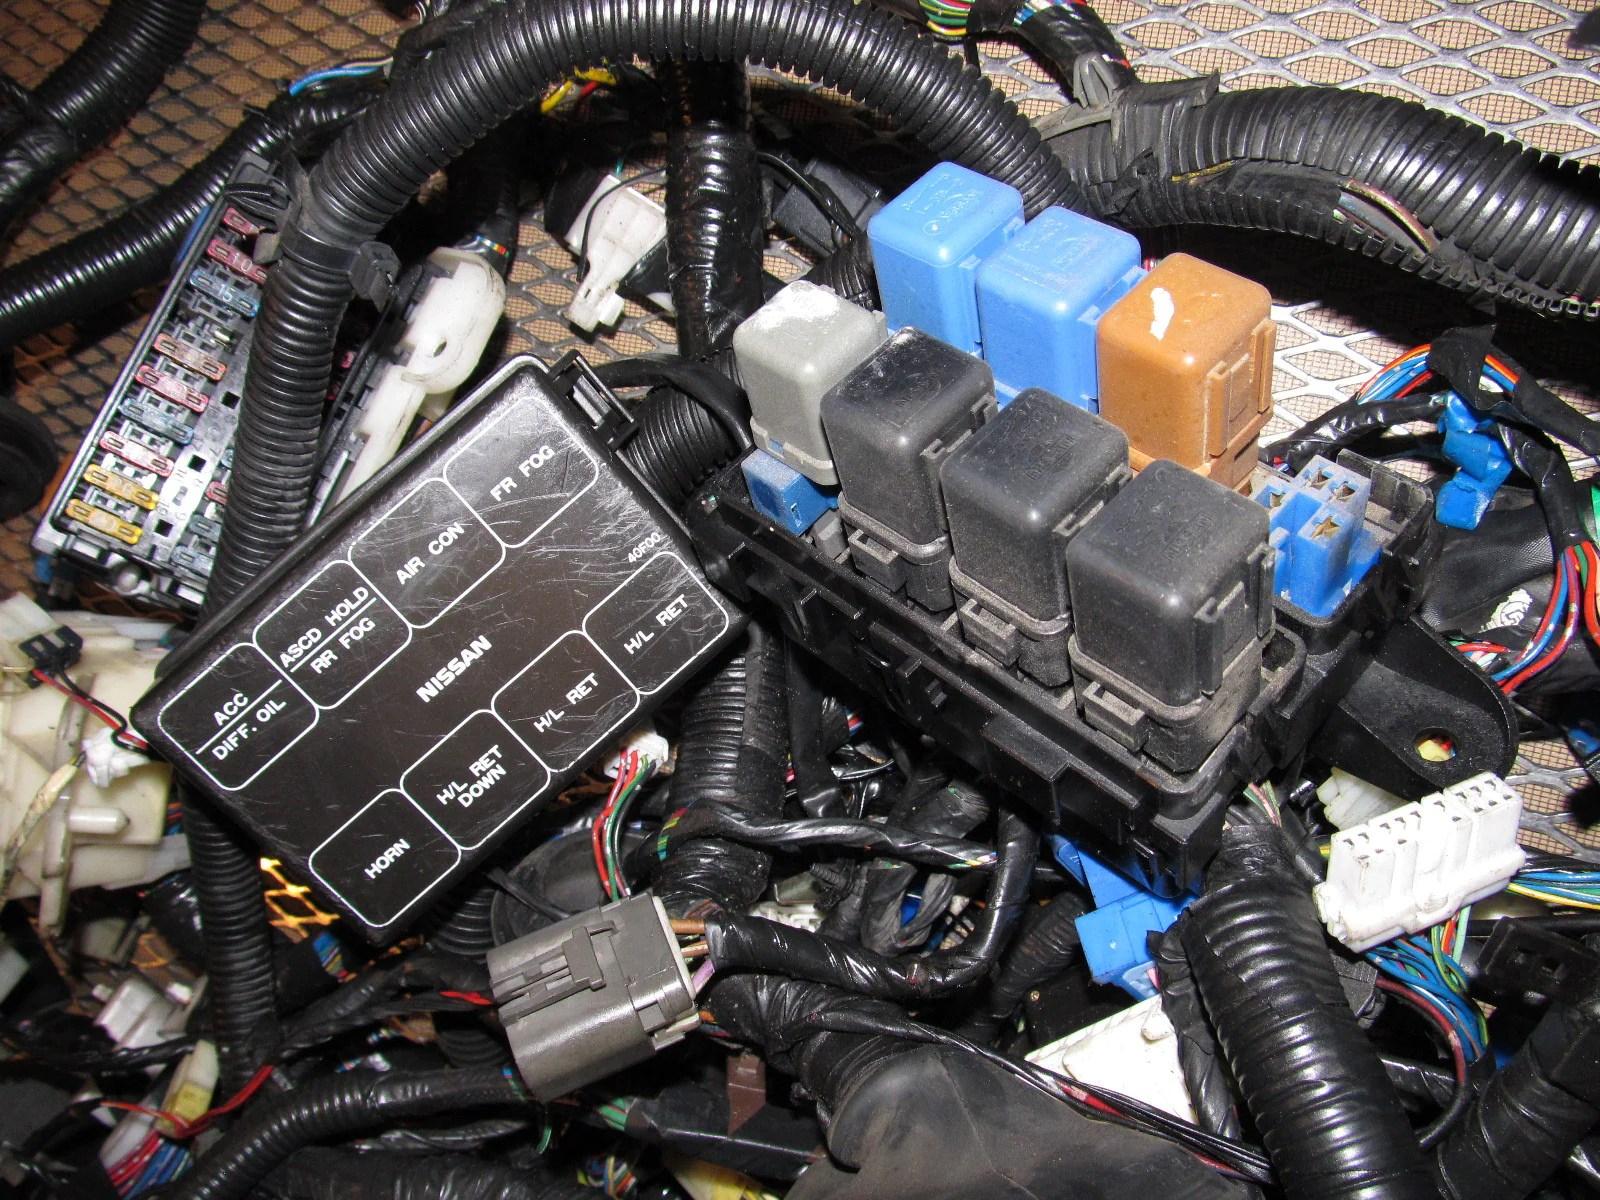 90 240sx fuse box schematic wiring diagrams m3 fuse box s13 240 fuse box [ 1600 x 1200 Pixel ]